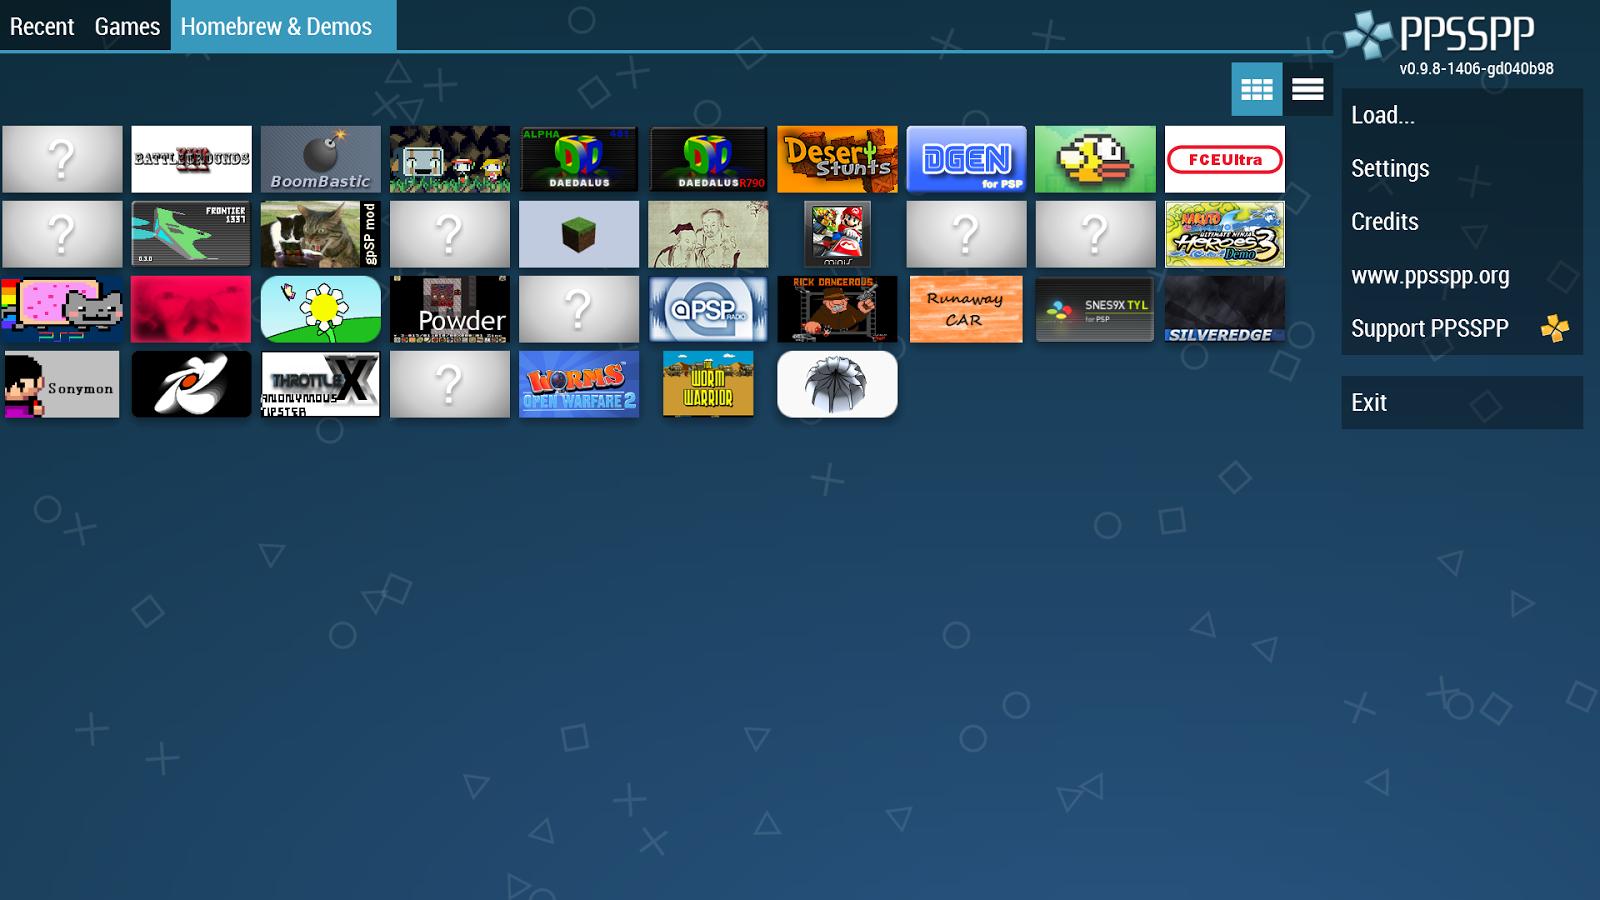 Ppsspp Gold Psp Emulator 1 2 2 For Pc Exe Apkbaby